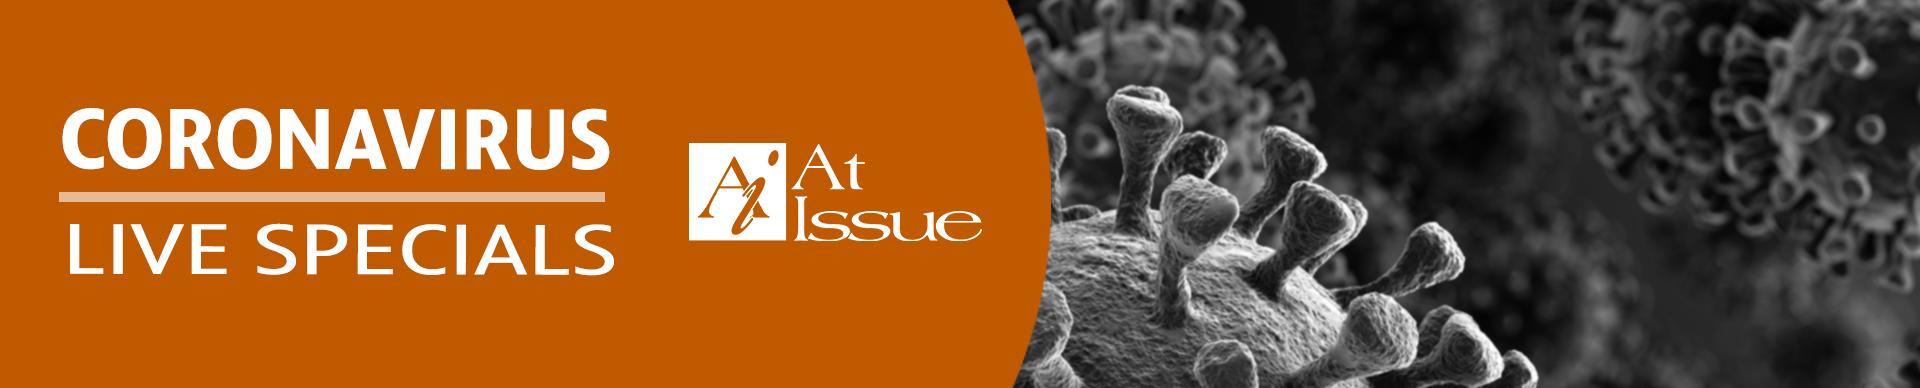 Coronavirus Live Specials | At Issue